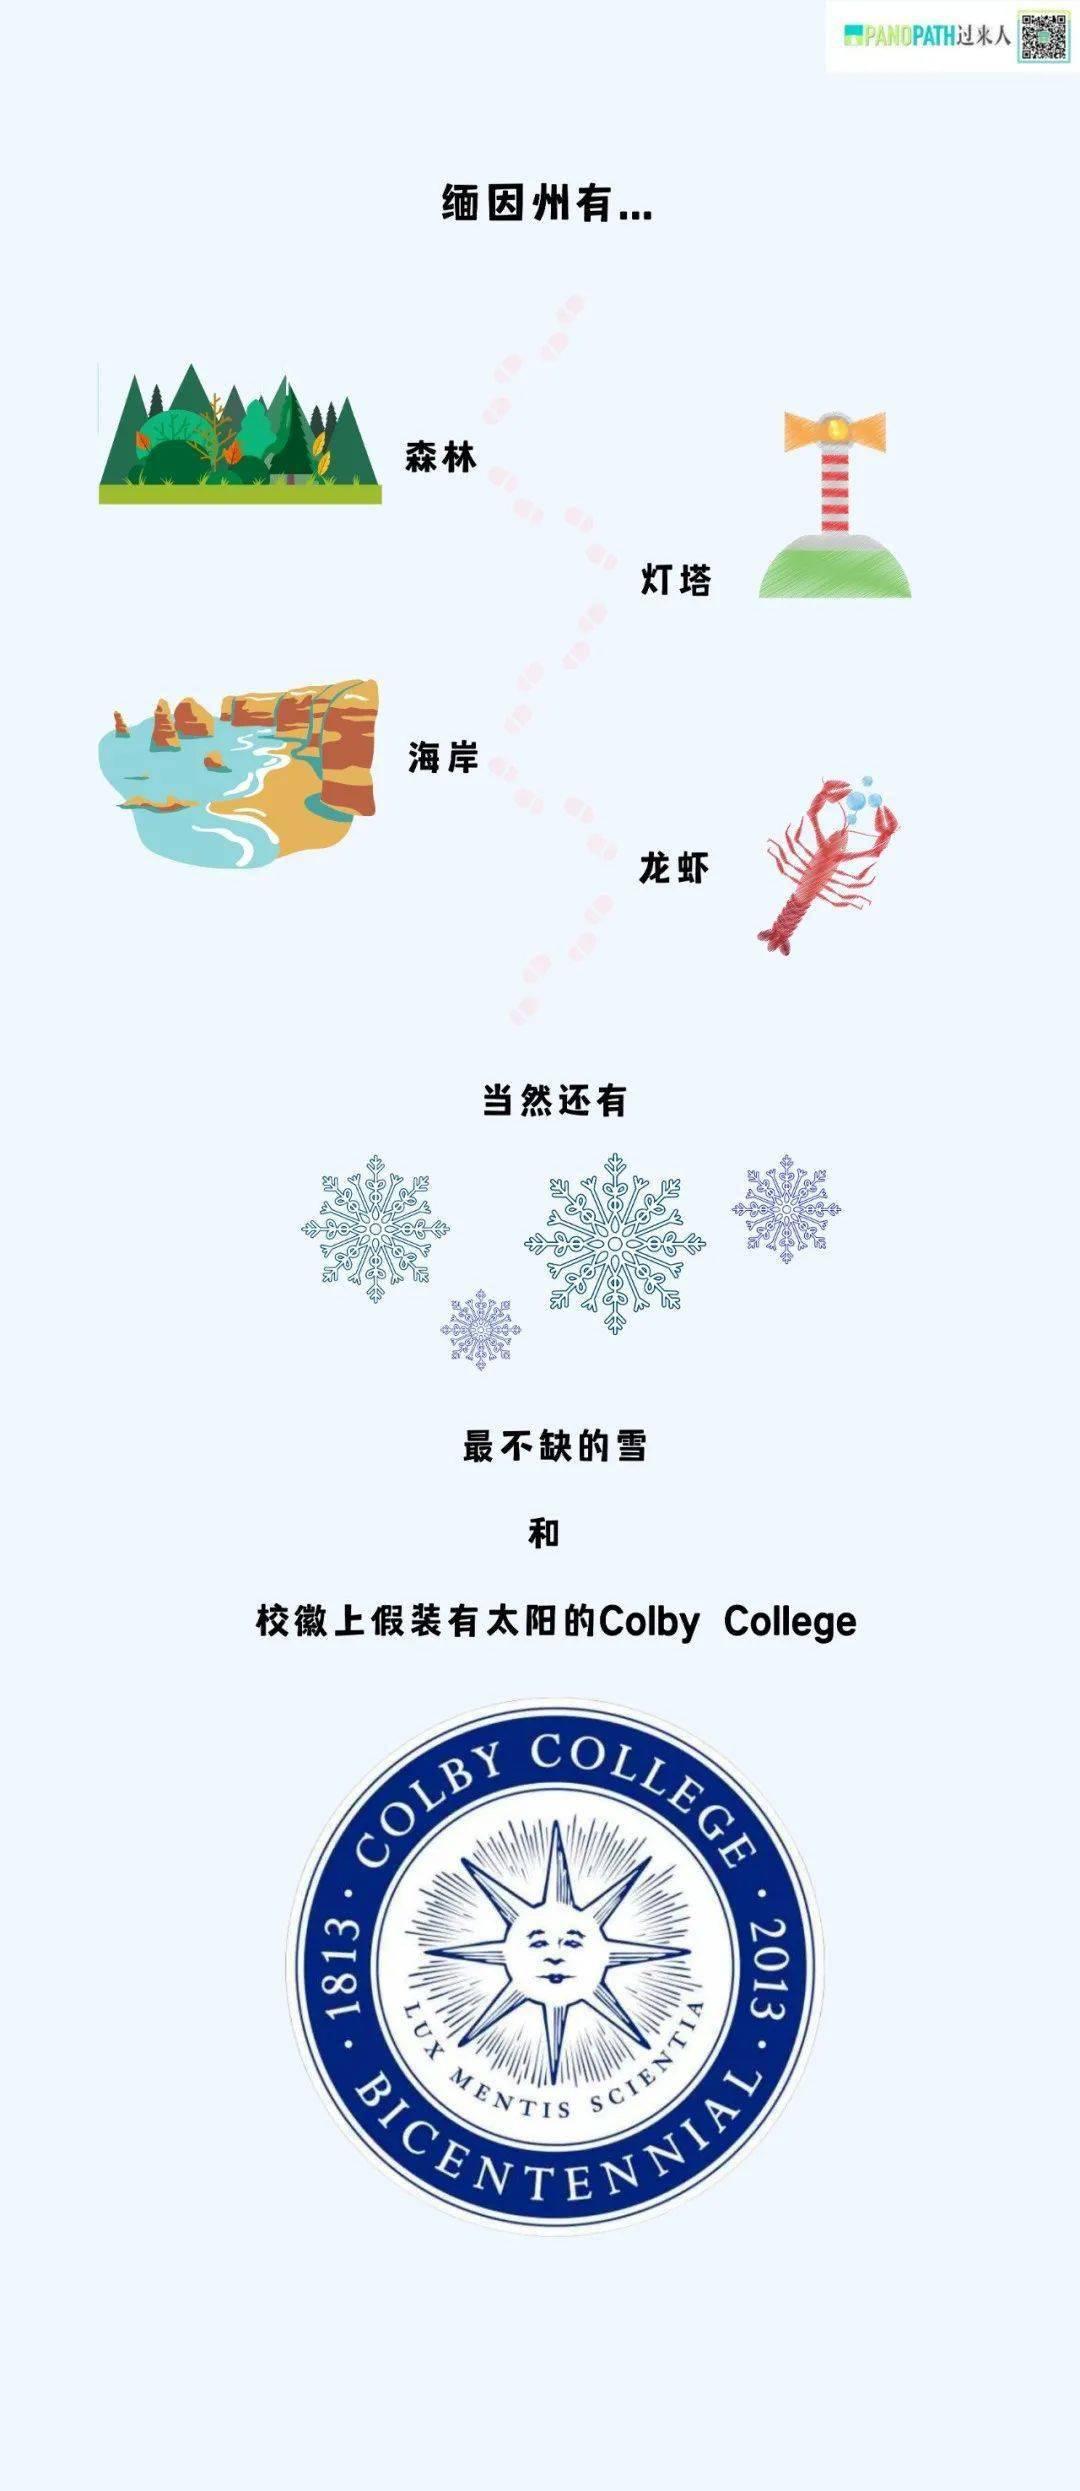 Colby College | 在雪国感受江南温婉和人文情怀